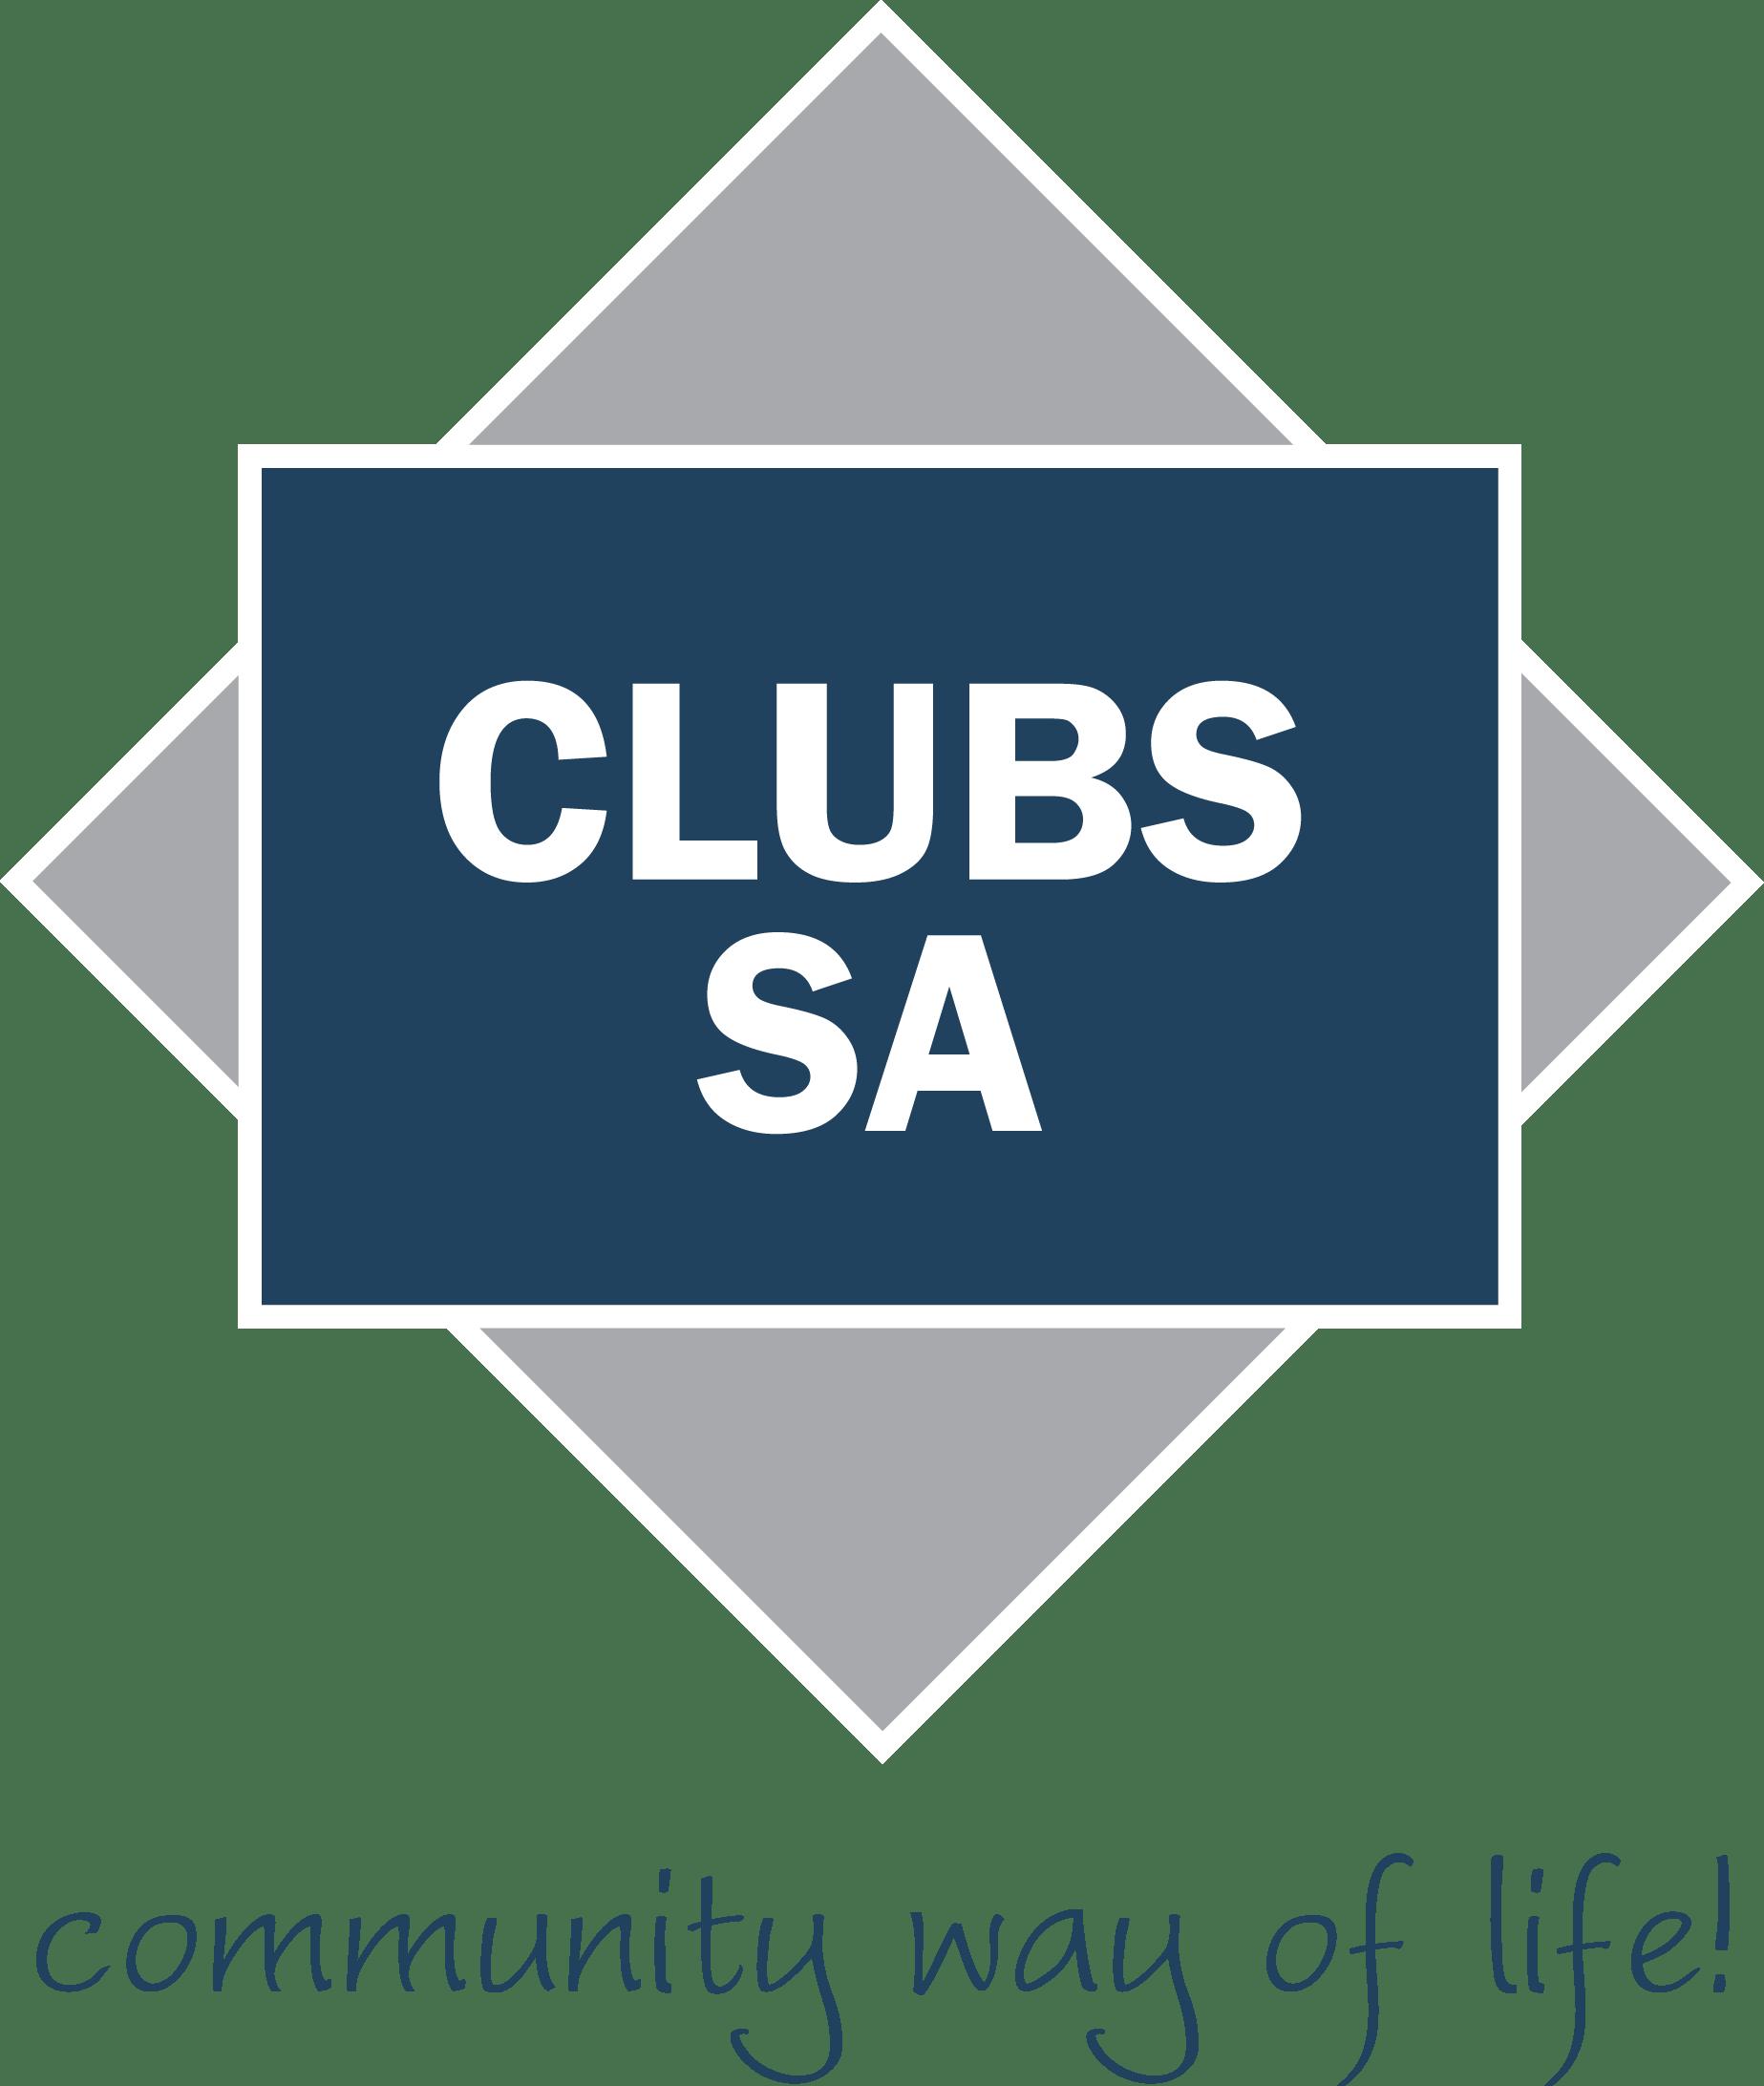 http://www.clubssa.com.au/